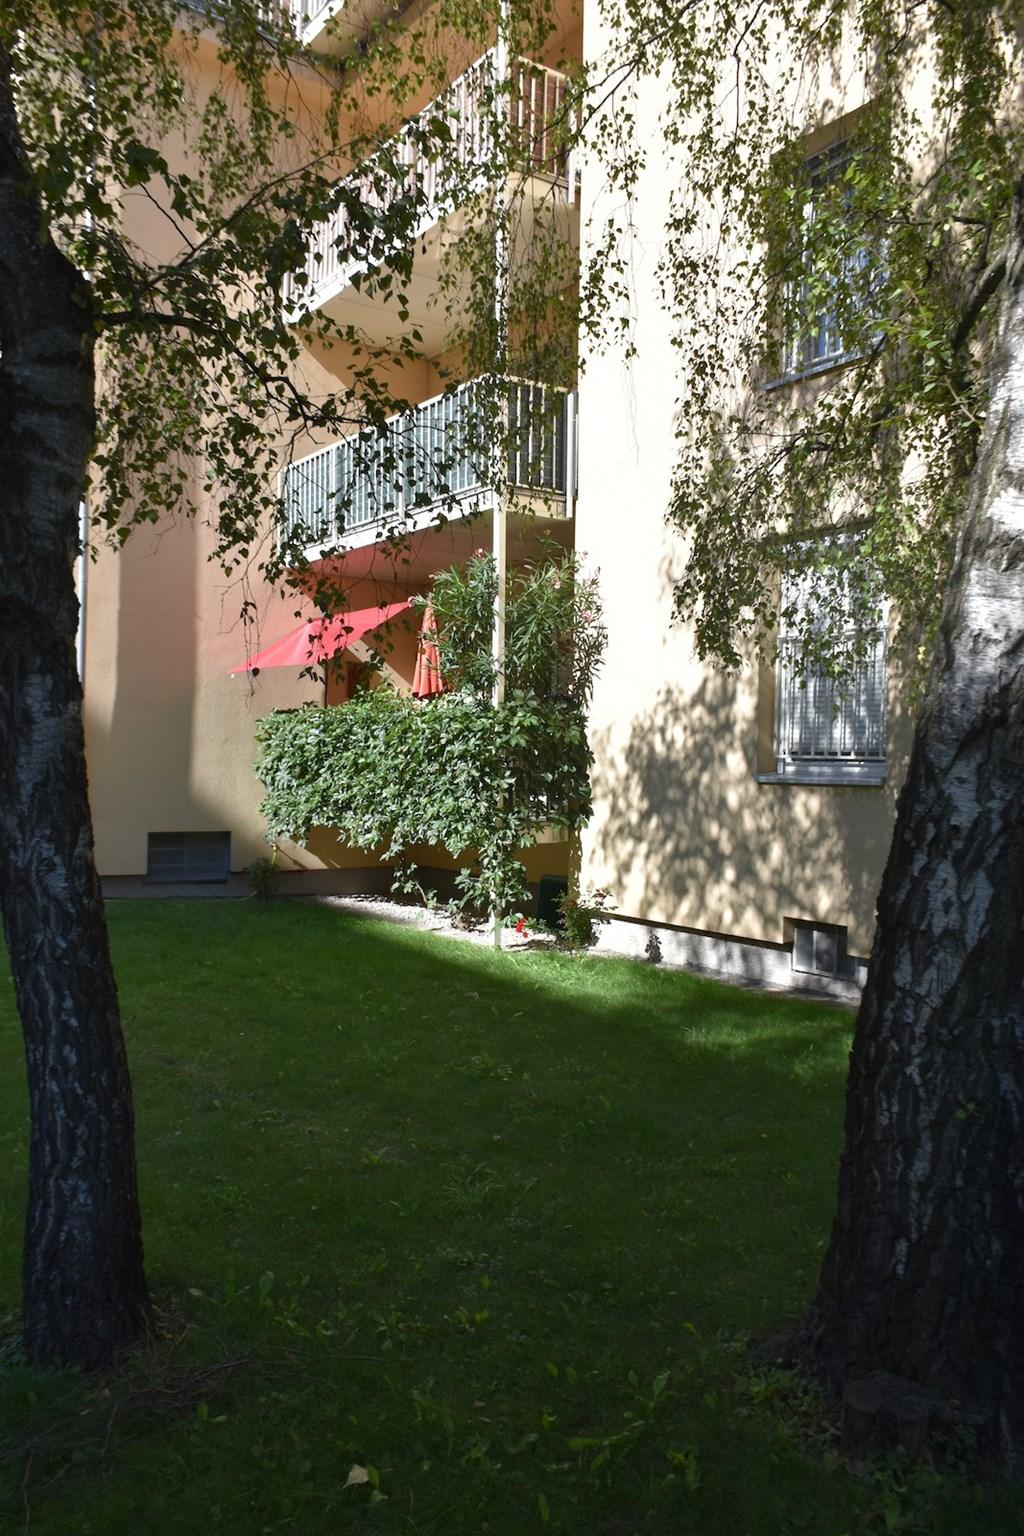 Garten Anlegen Neubau Best Of 2 Zimmer Wohnung Mieten In 1020 Wien Leopoldstadt